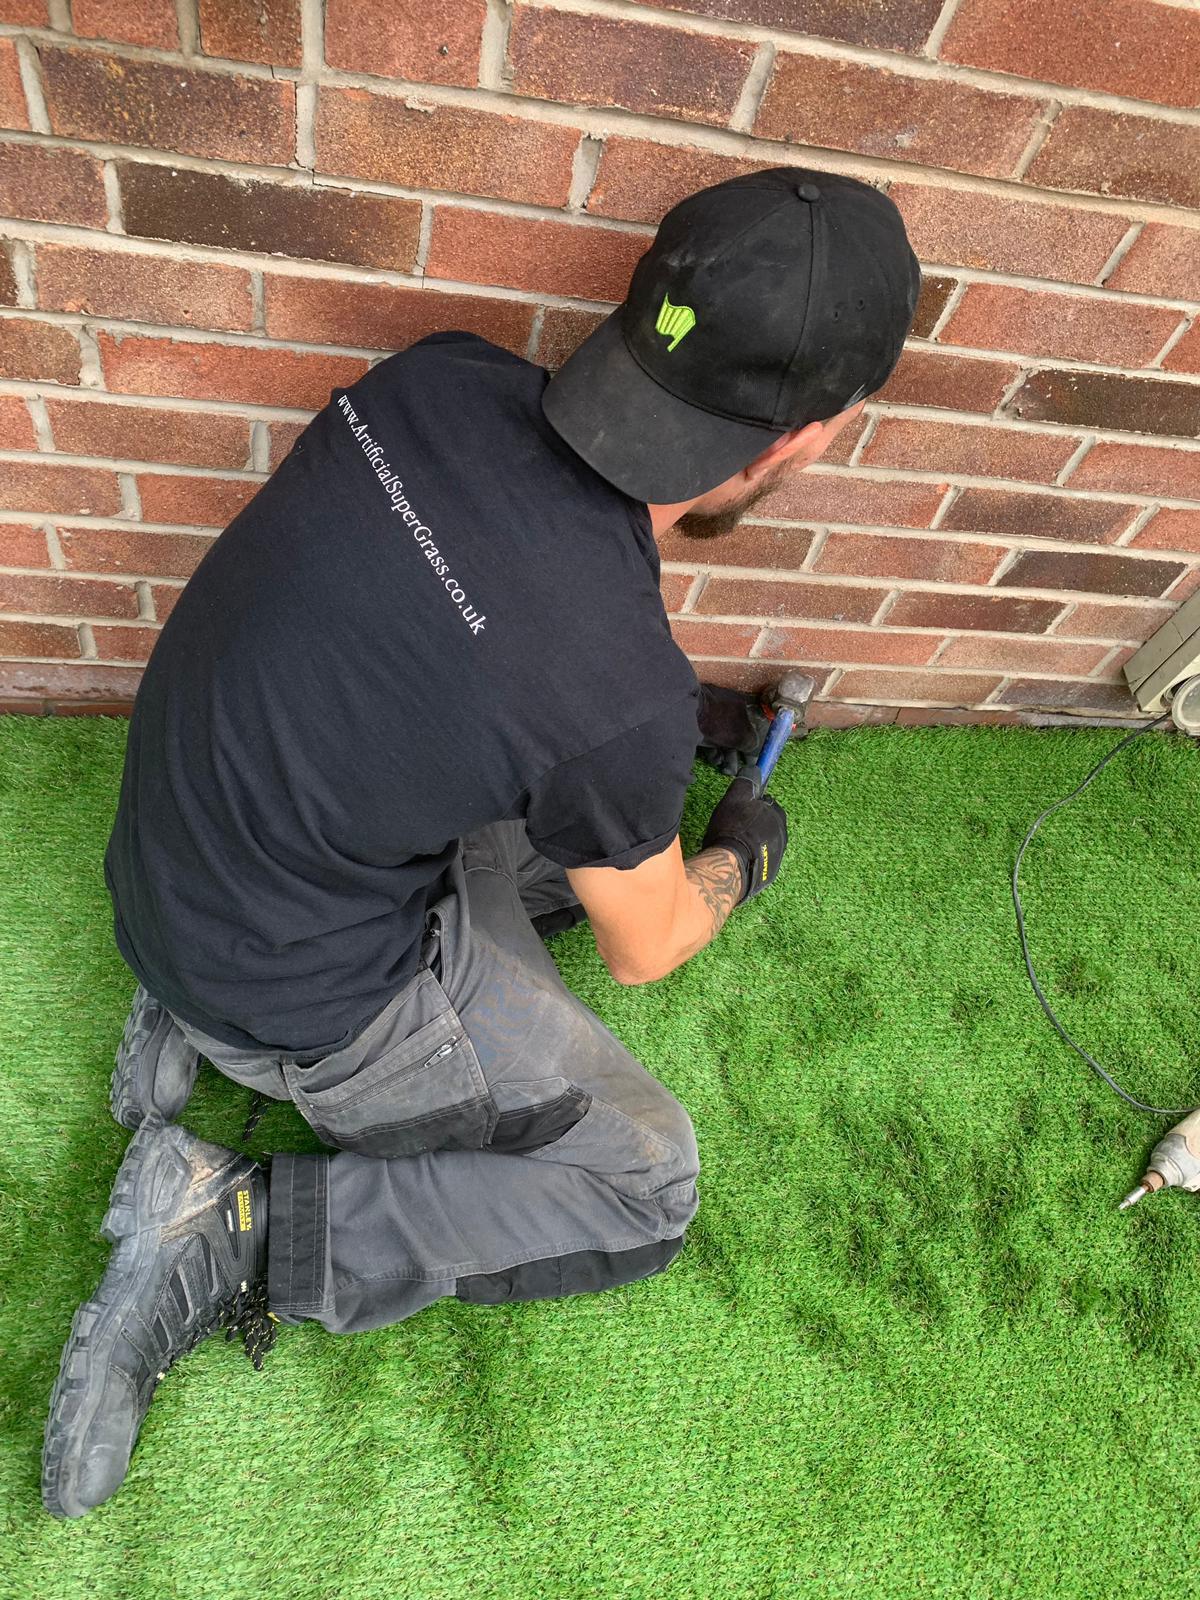 Fake Grass For Dogs Menston Artificial Super Grass